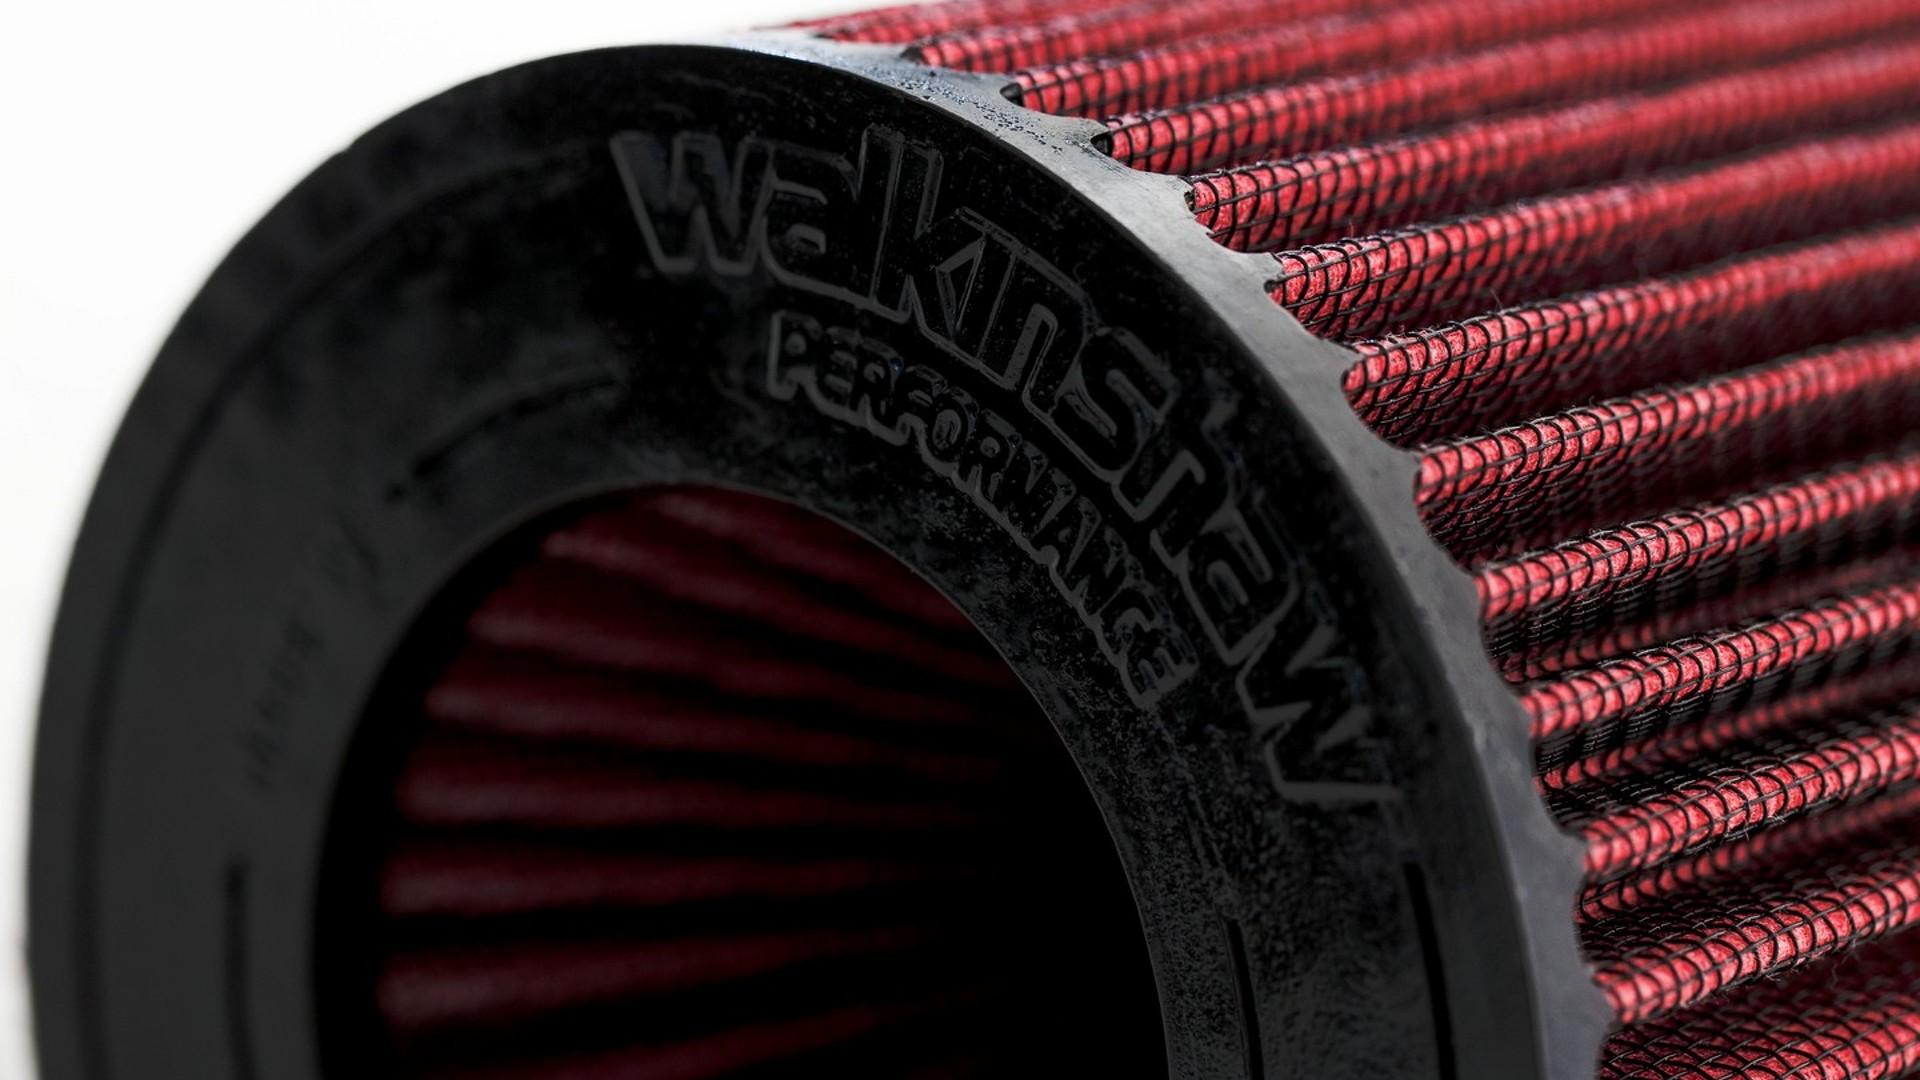 Walkinshaw Performance takes the LS3 6 2-liter V8 engine to